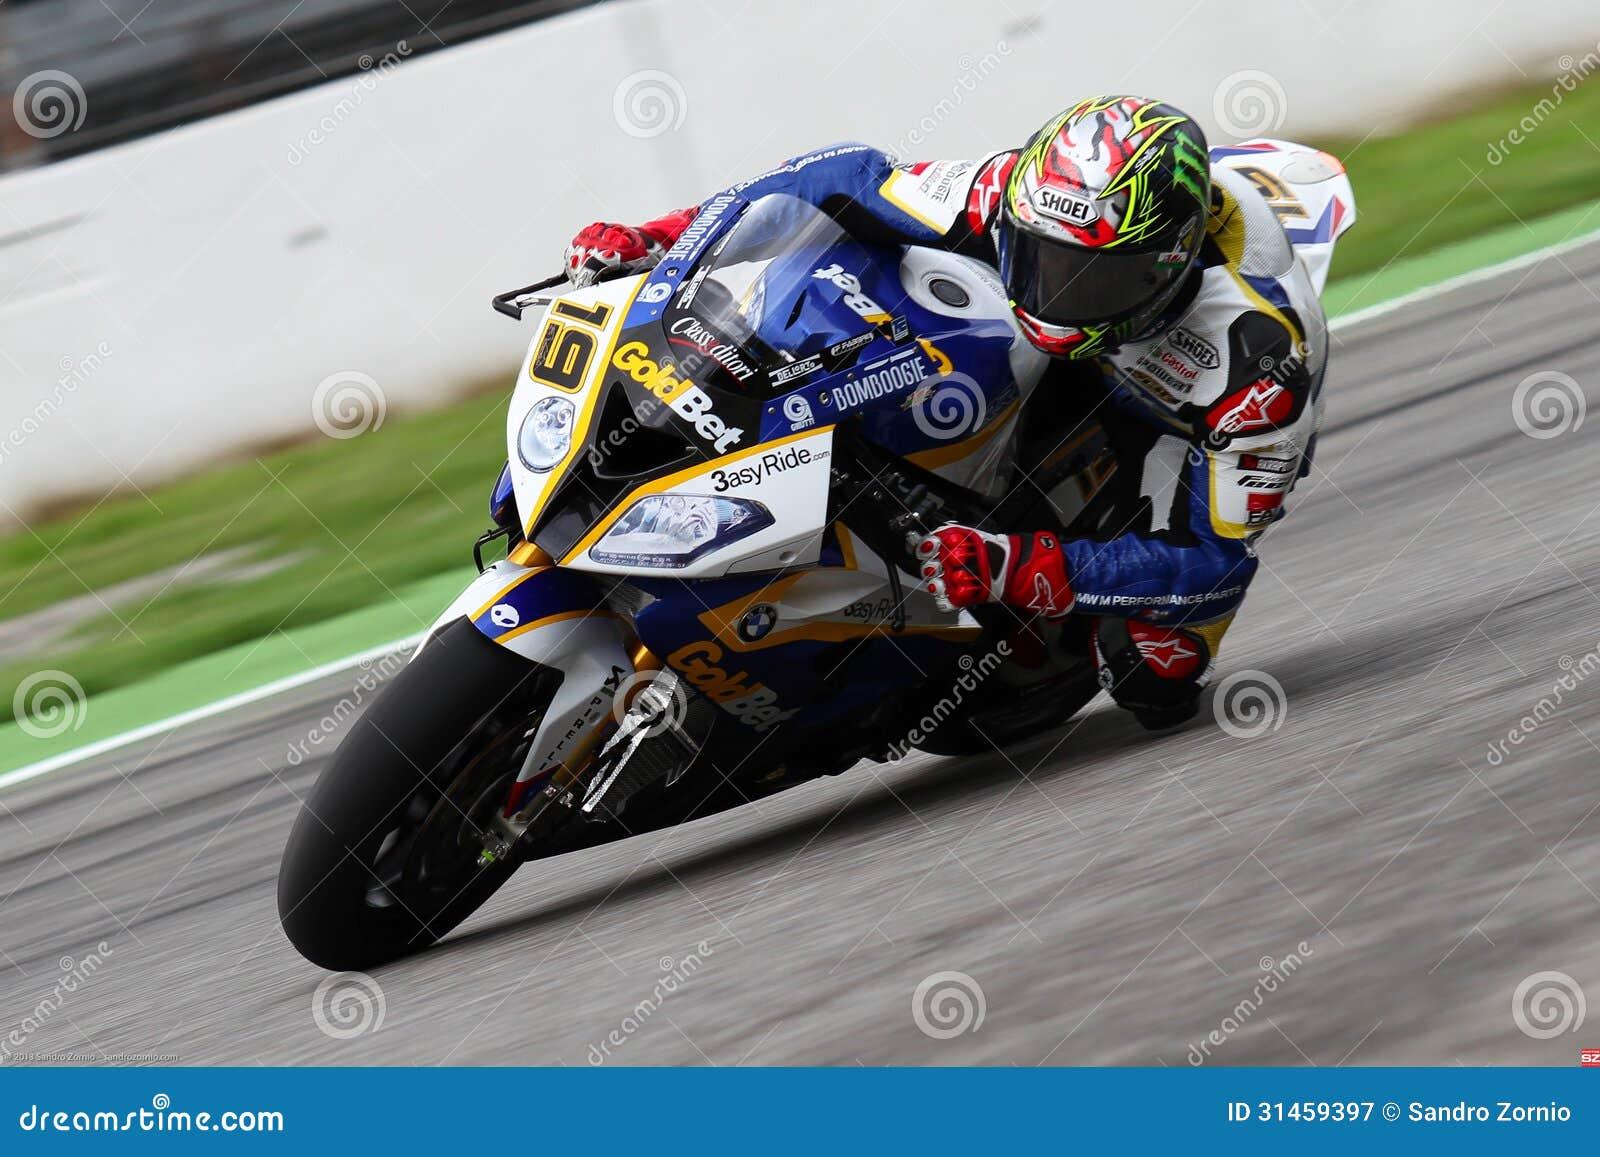 Chaz Davies #19 on BMW S1000 RR with BMW Motorrad GoldBet SBK Team Superbike WSBK